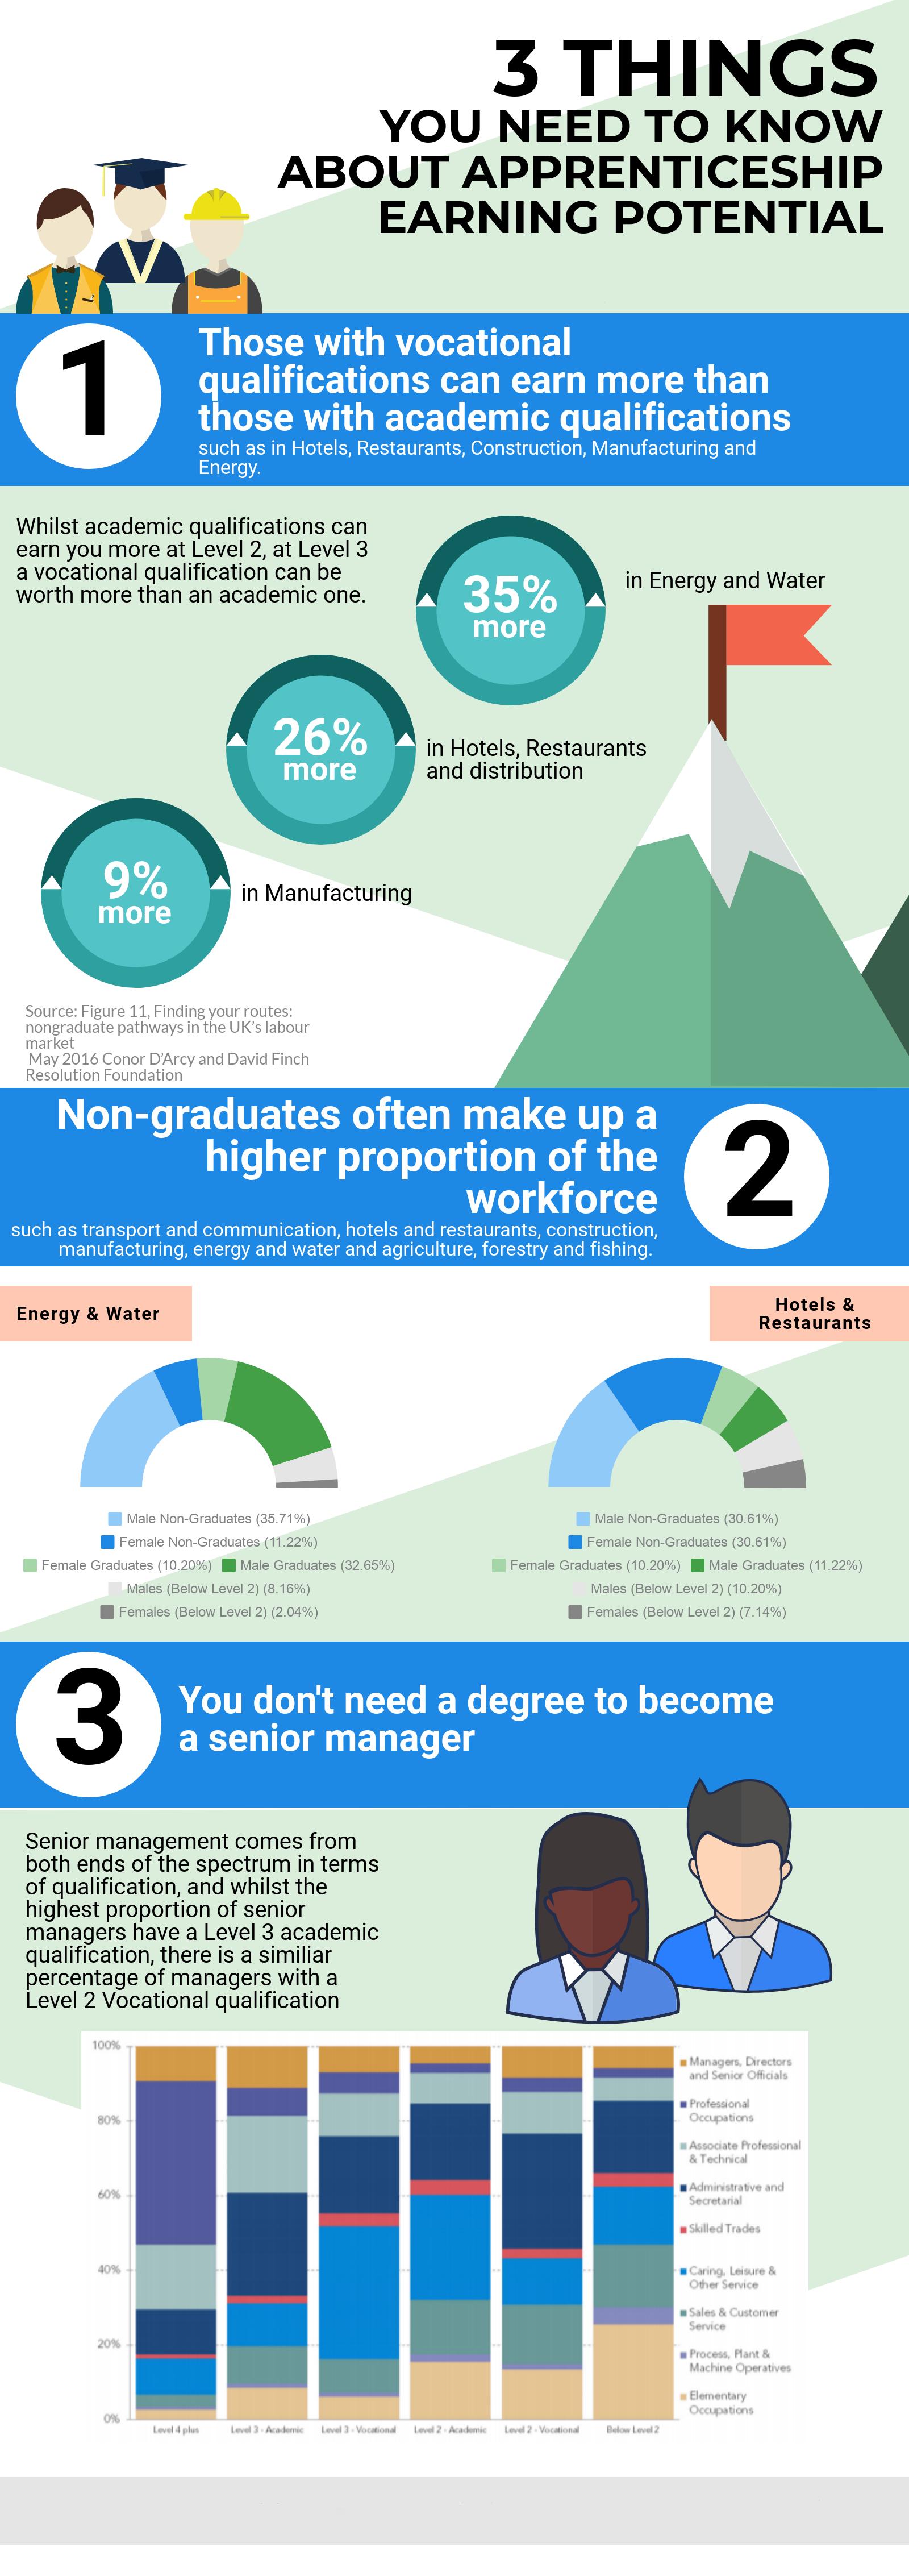 Apprenticeships Earning Potential-1